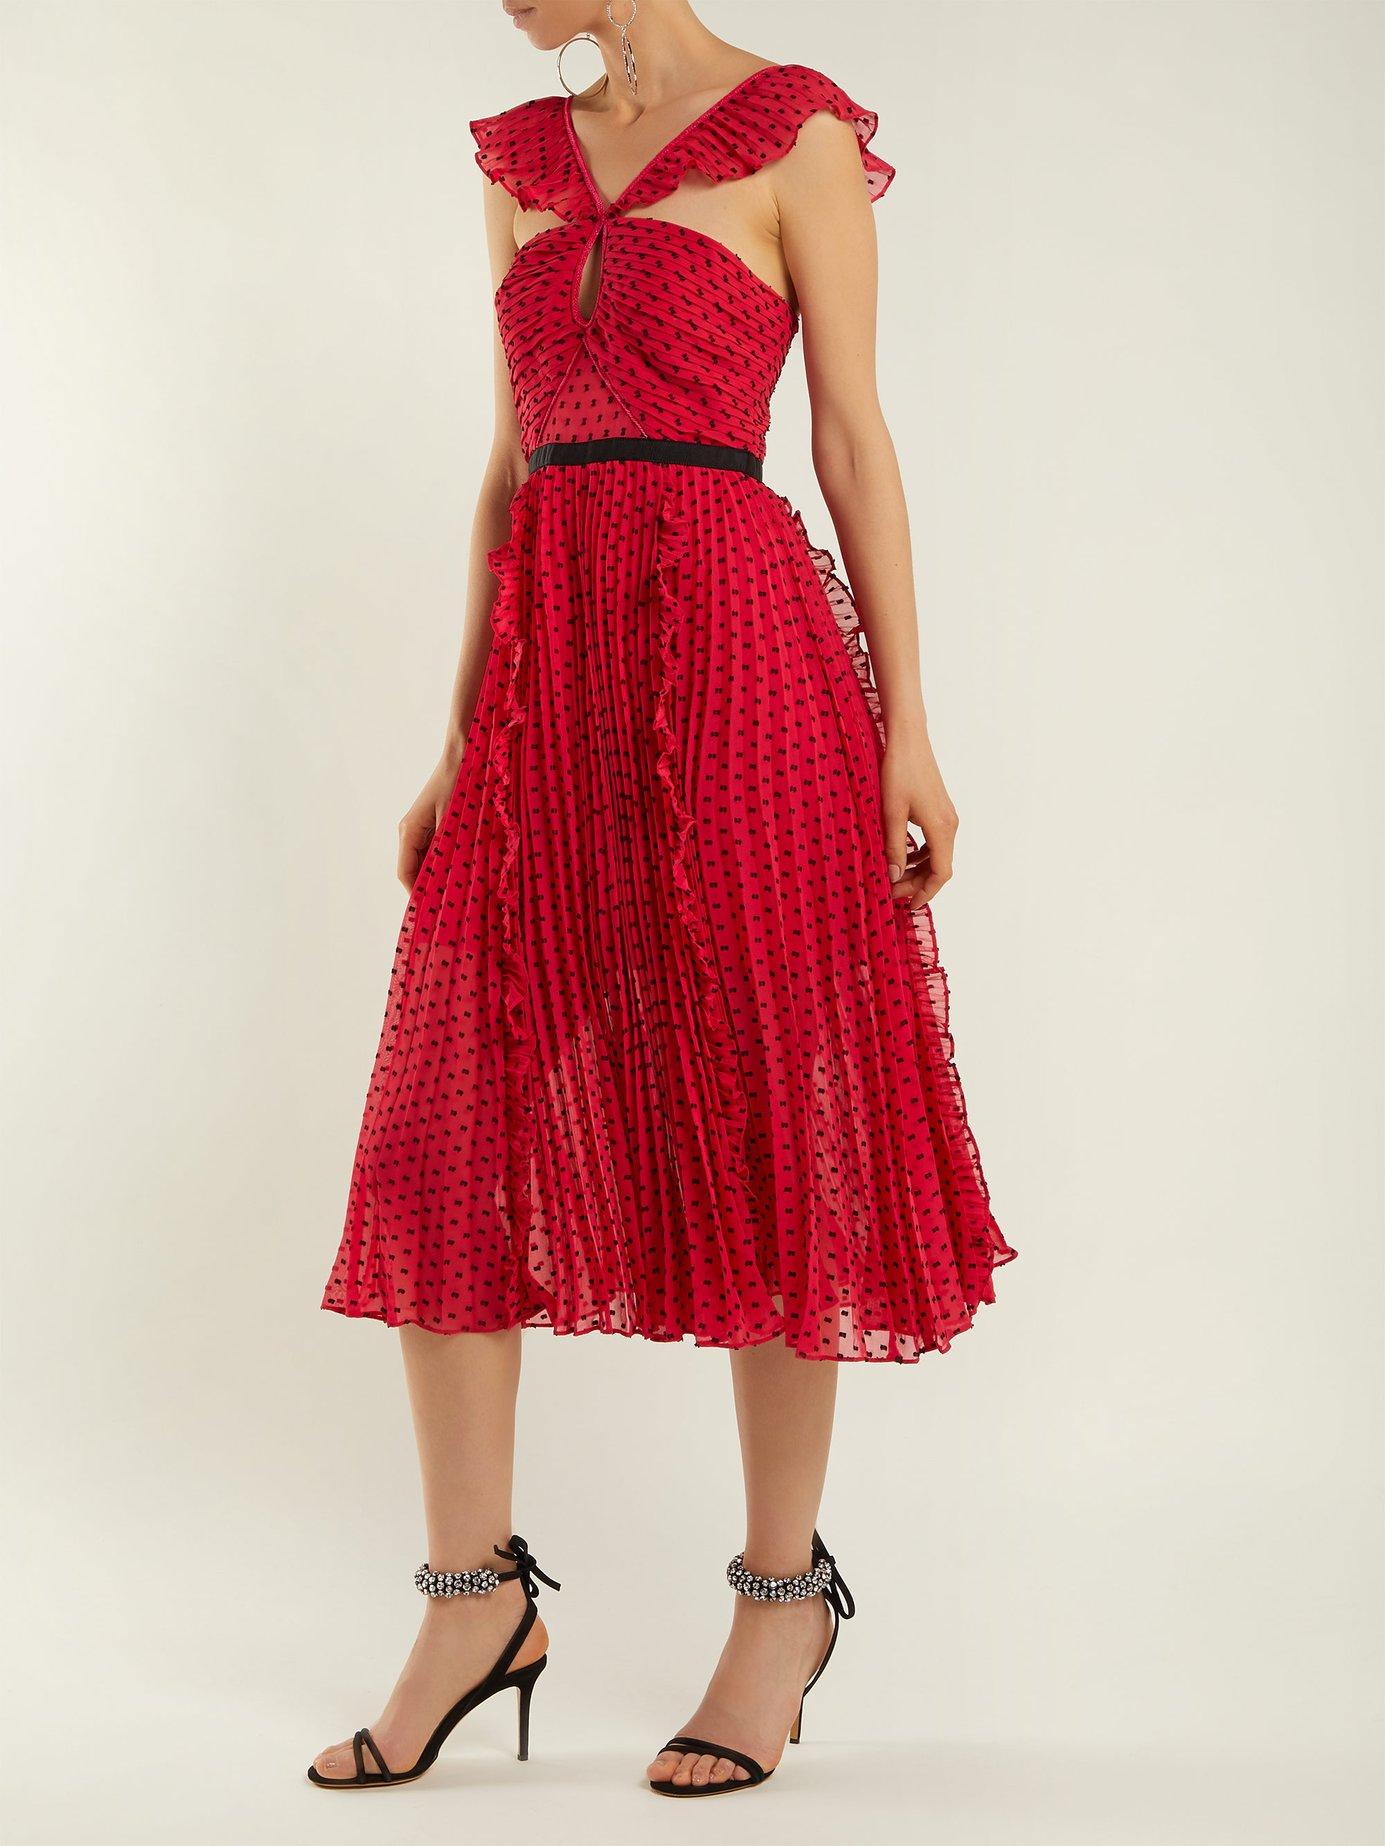 Ruffle-trimmed pleated dress by Self-Portrait